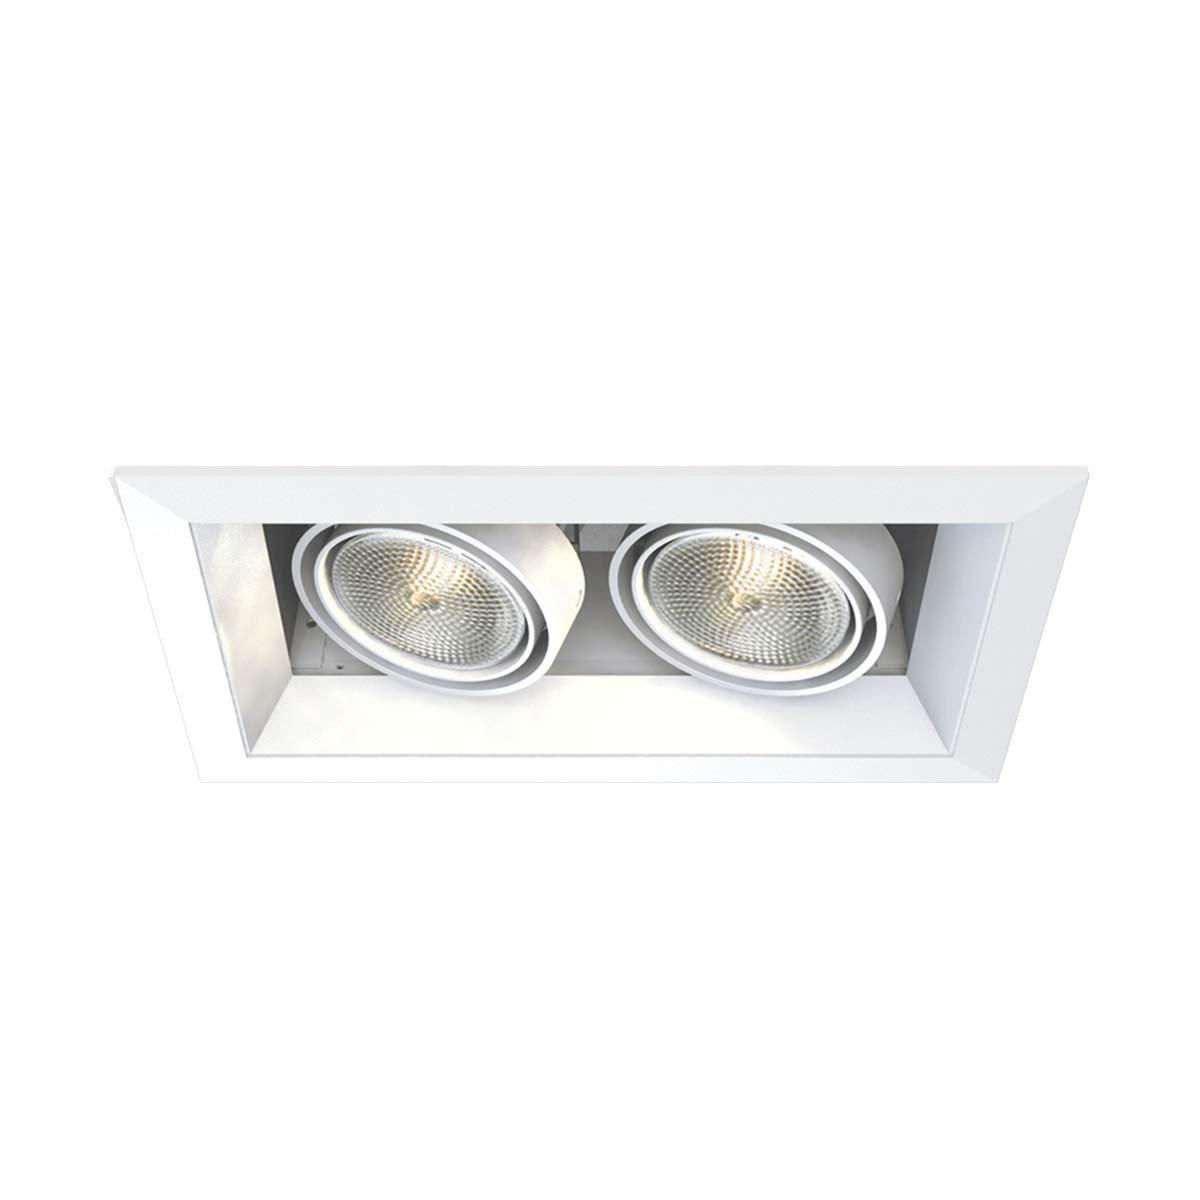 Eurofase TE162 2-Light PAR20 Multiple Recessed Light Fixture, White